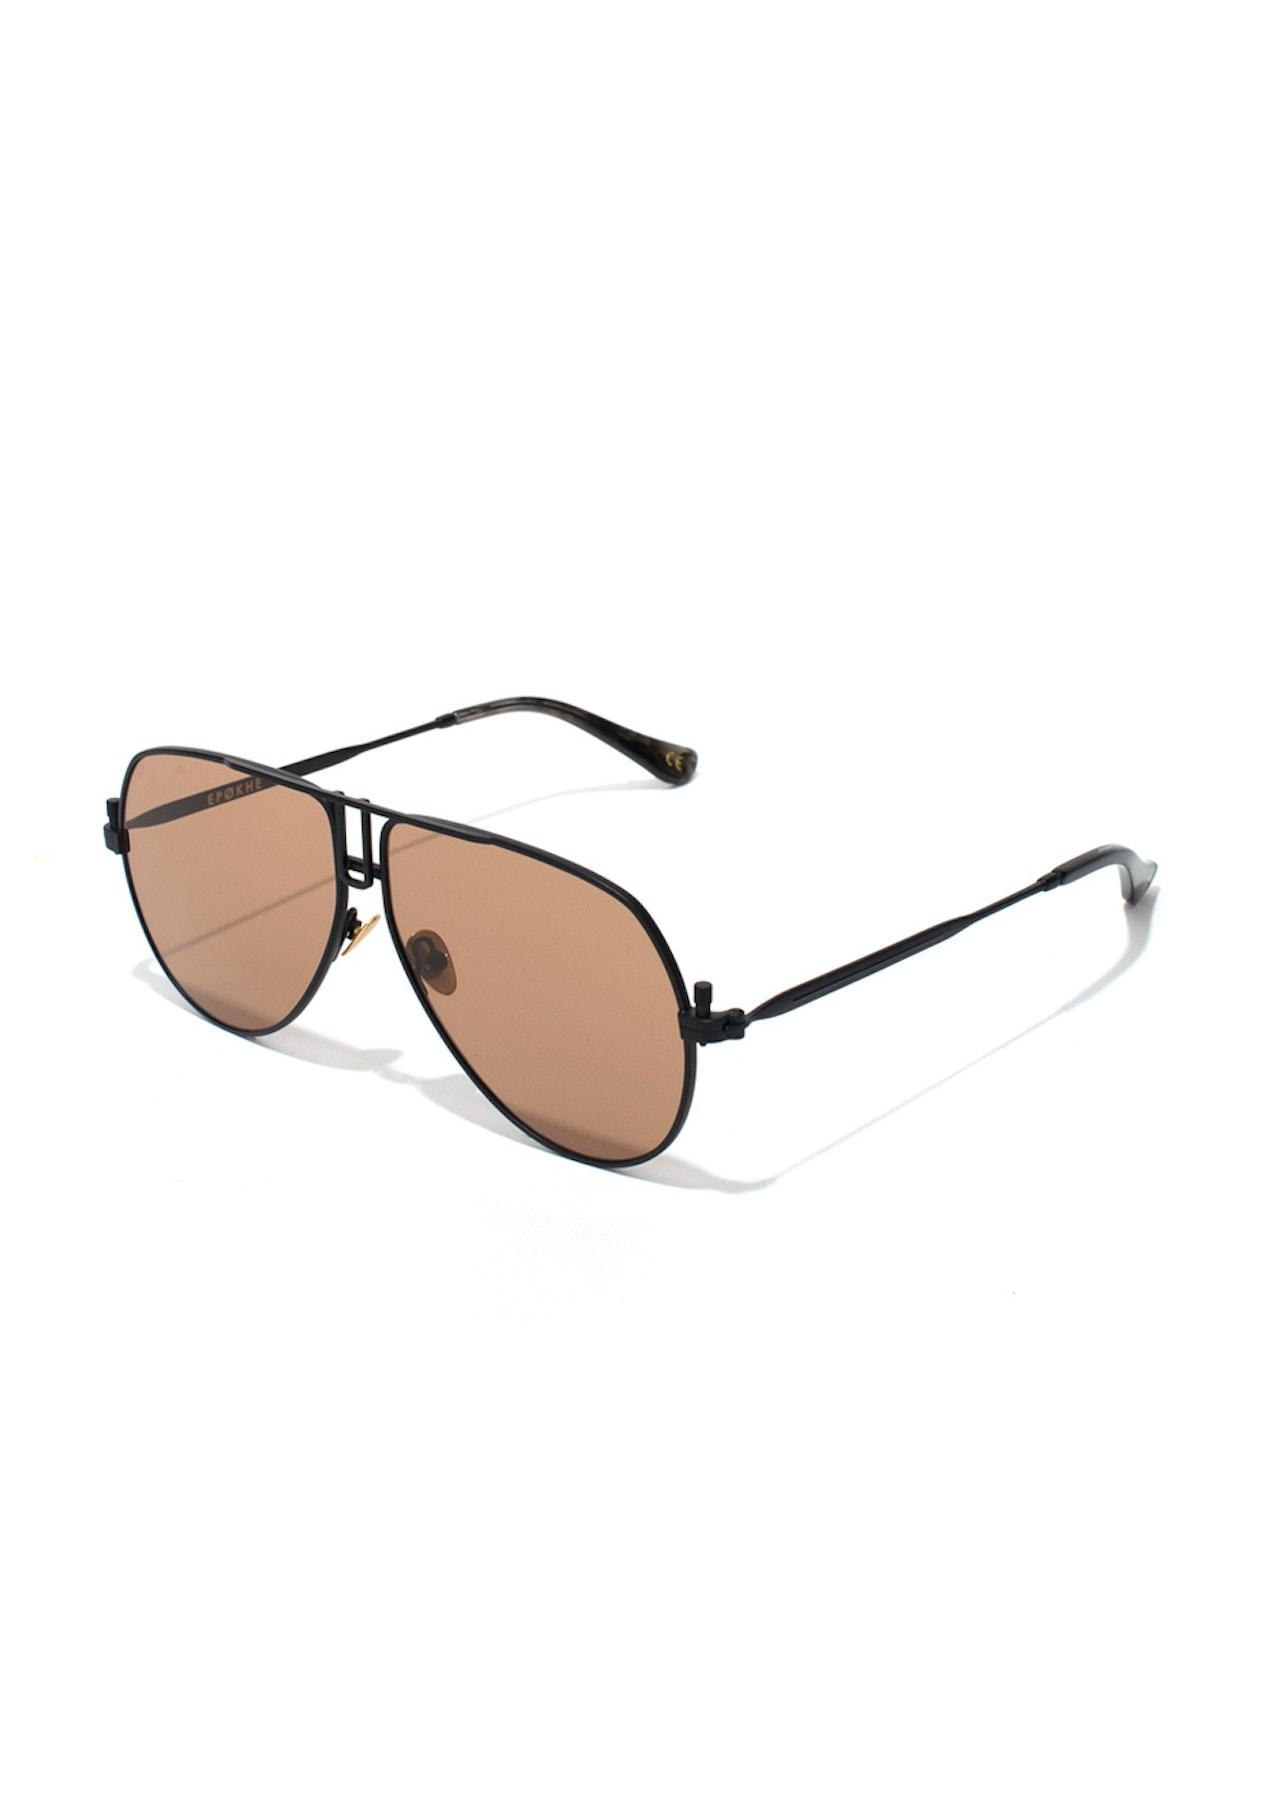 1c11b80e7f46a Epokhe Eyewear - Lev - Black Matte - Epokhe Eyewear From  29.99 - Onceit